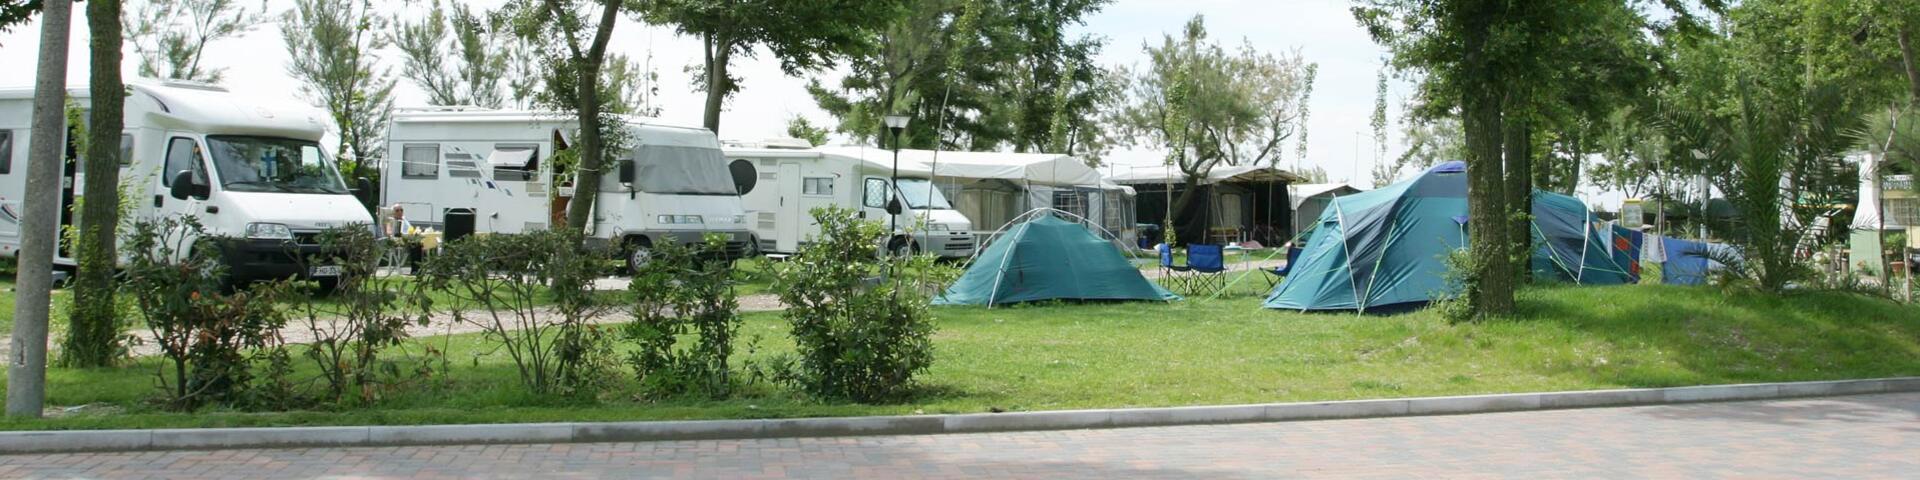 campingoasi it camping 005